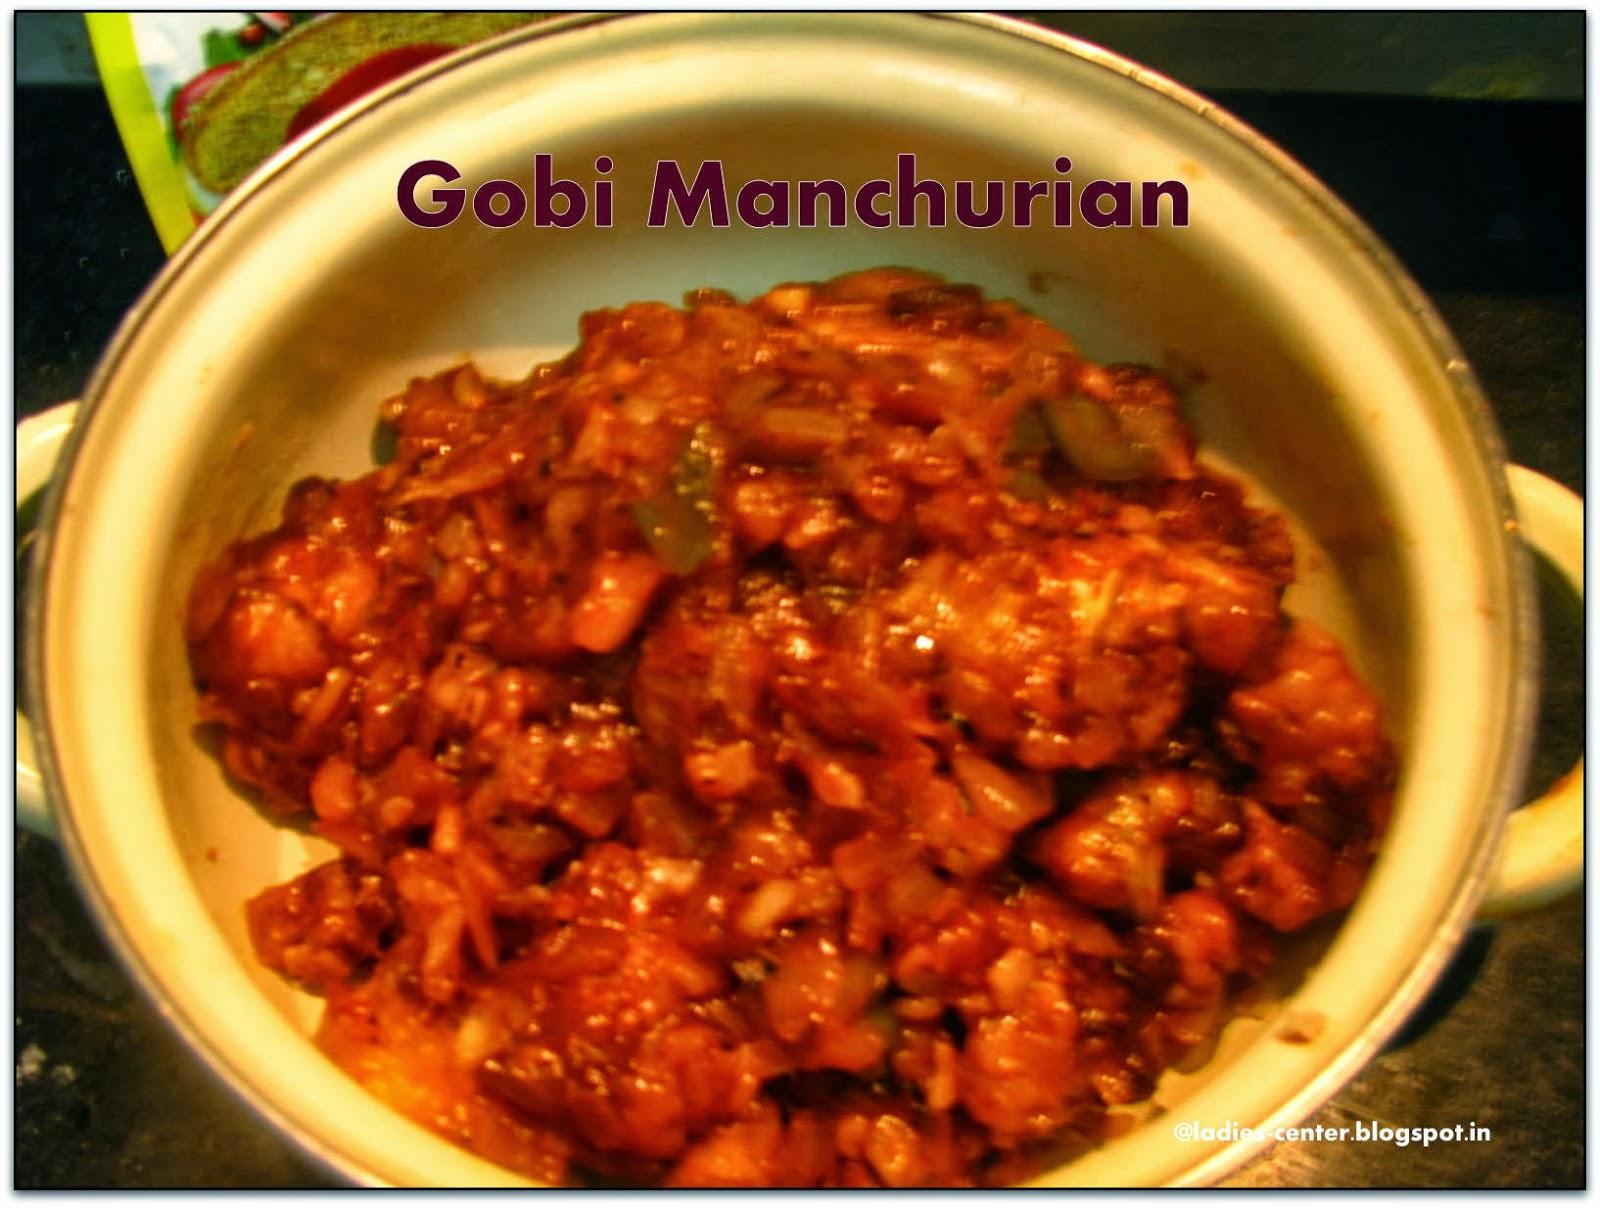 wet gobi manchurian recipe